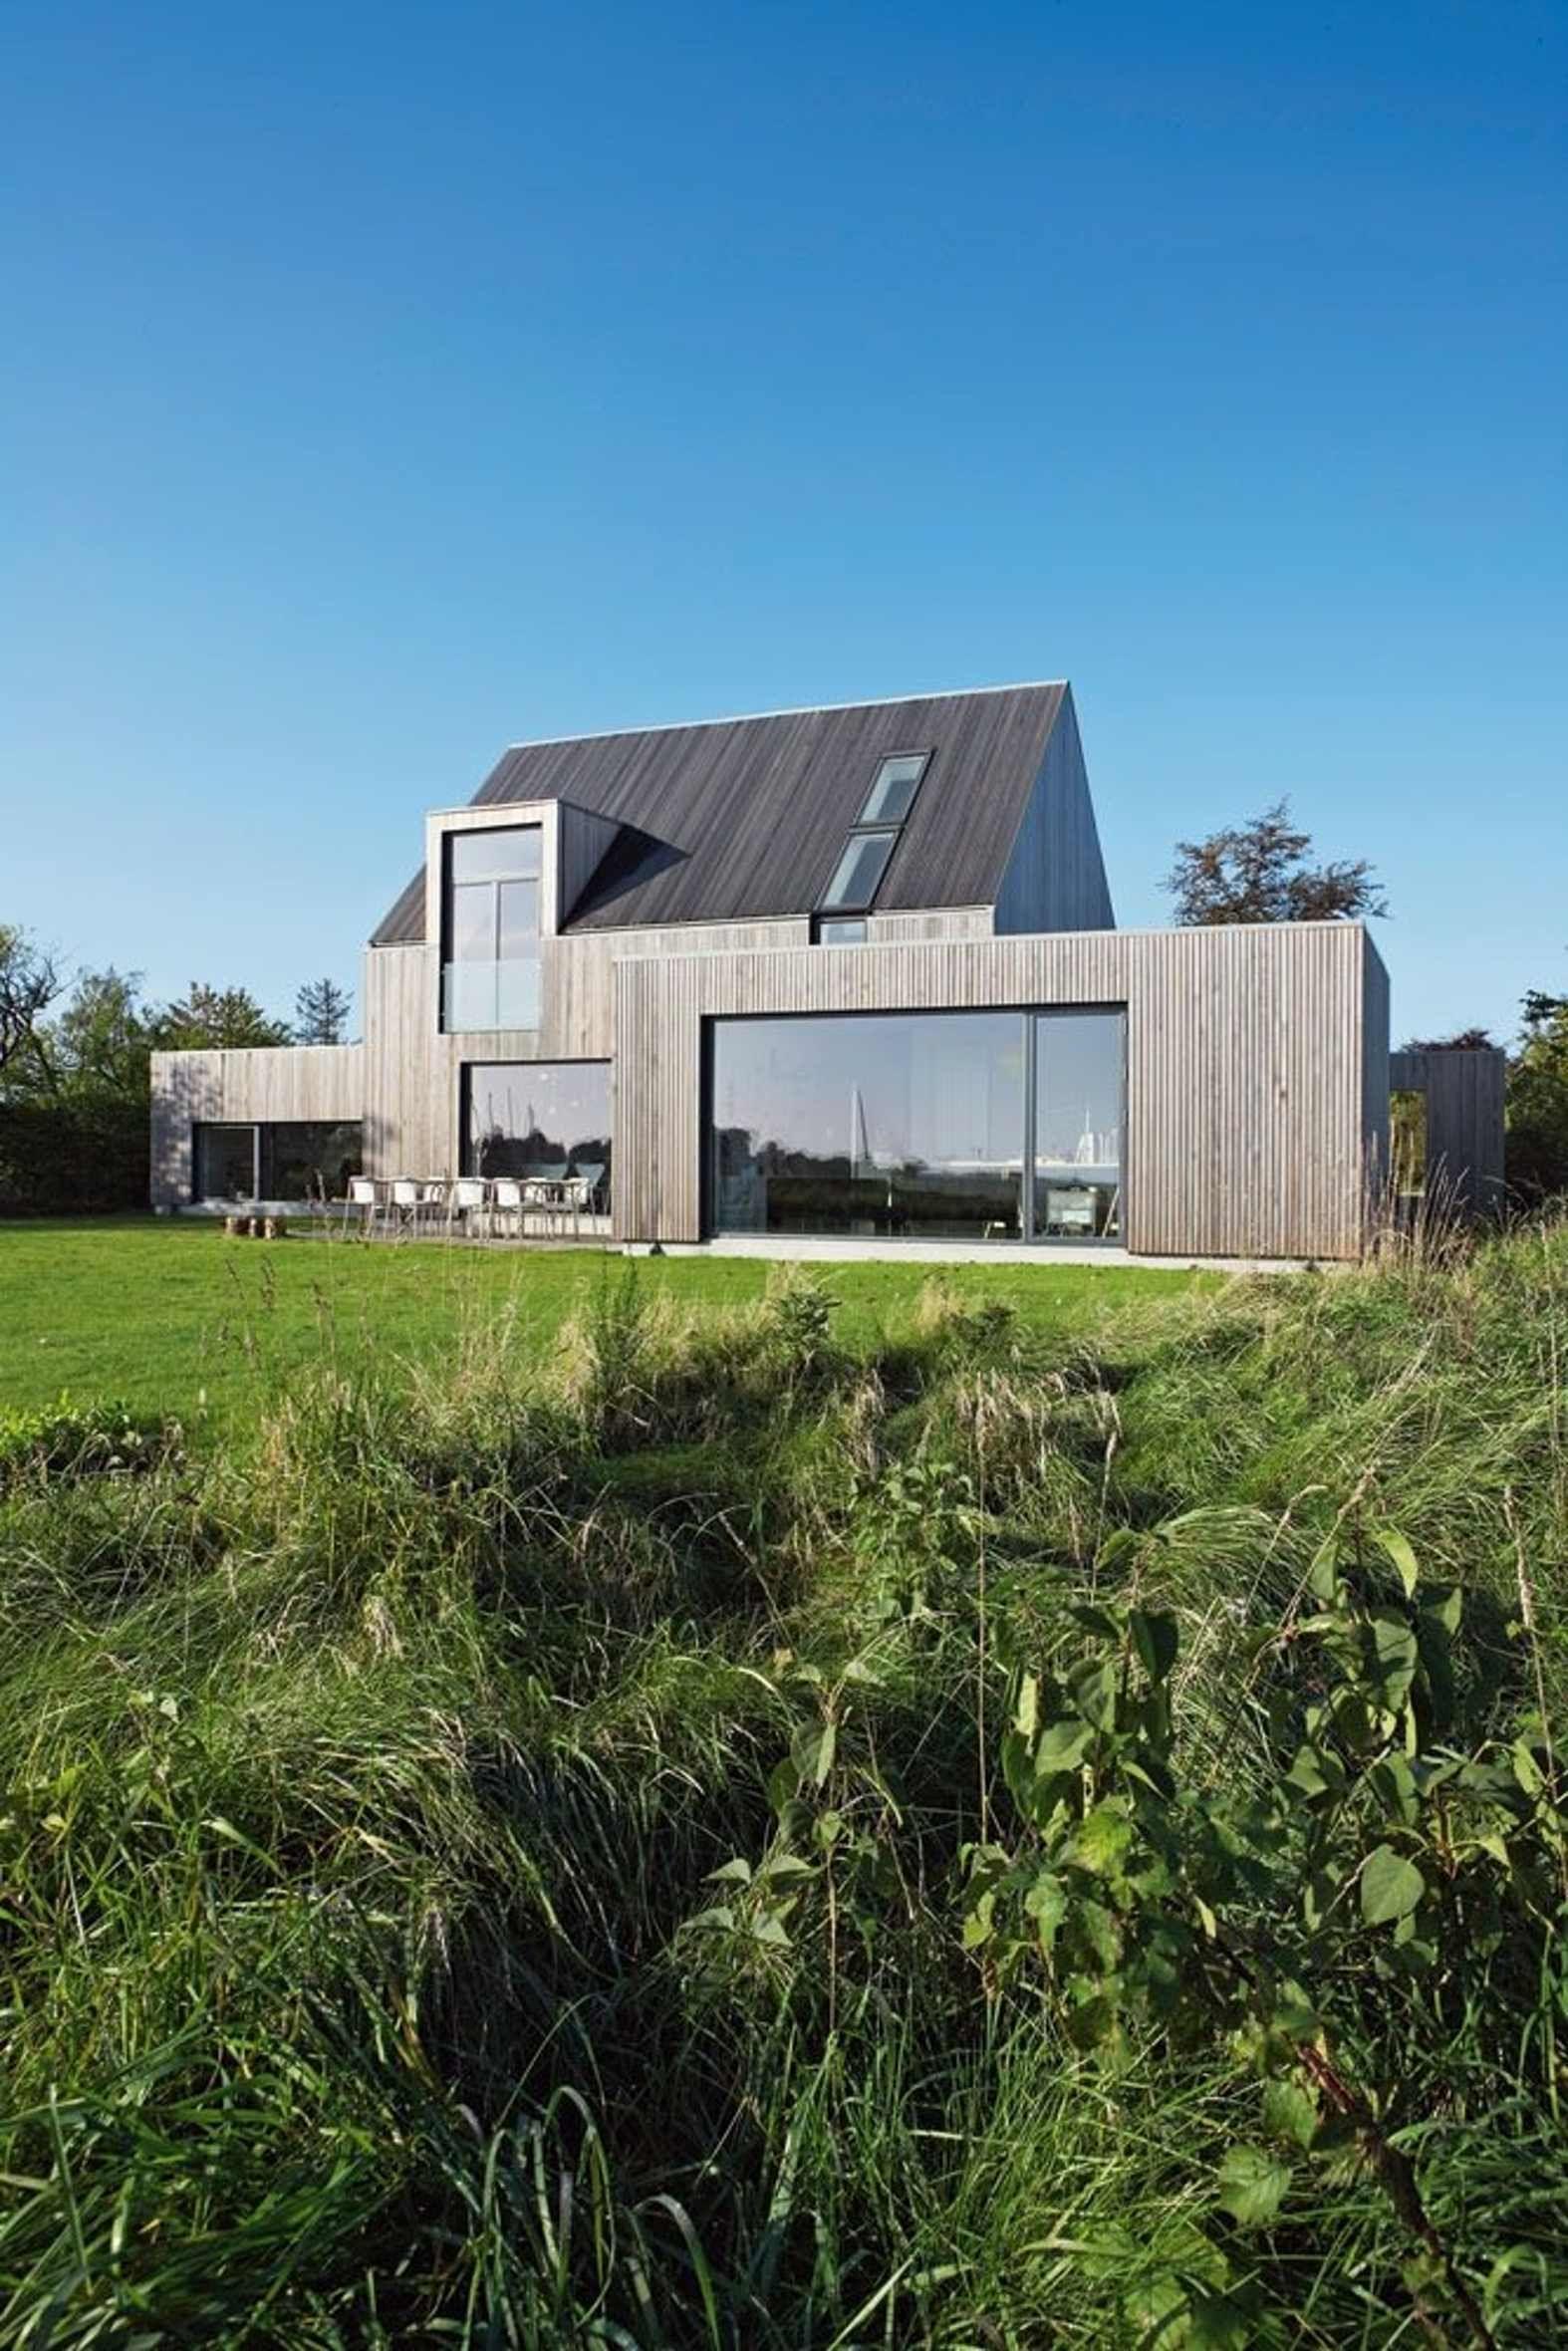 ^ 1000+ images about moderne huizen met zadeldak on Pinterest